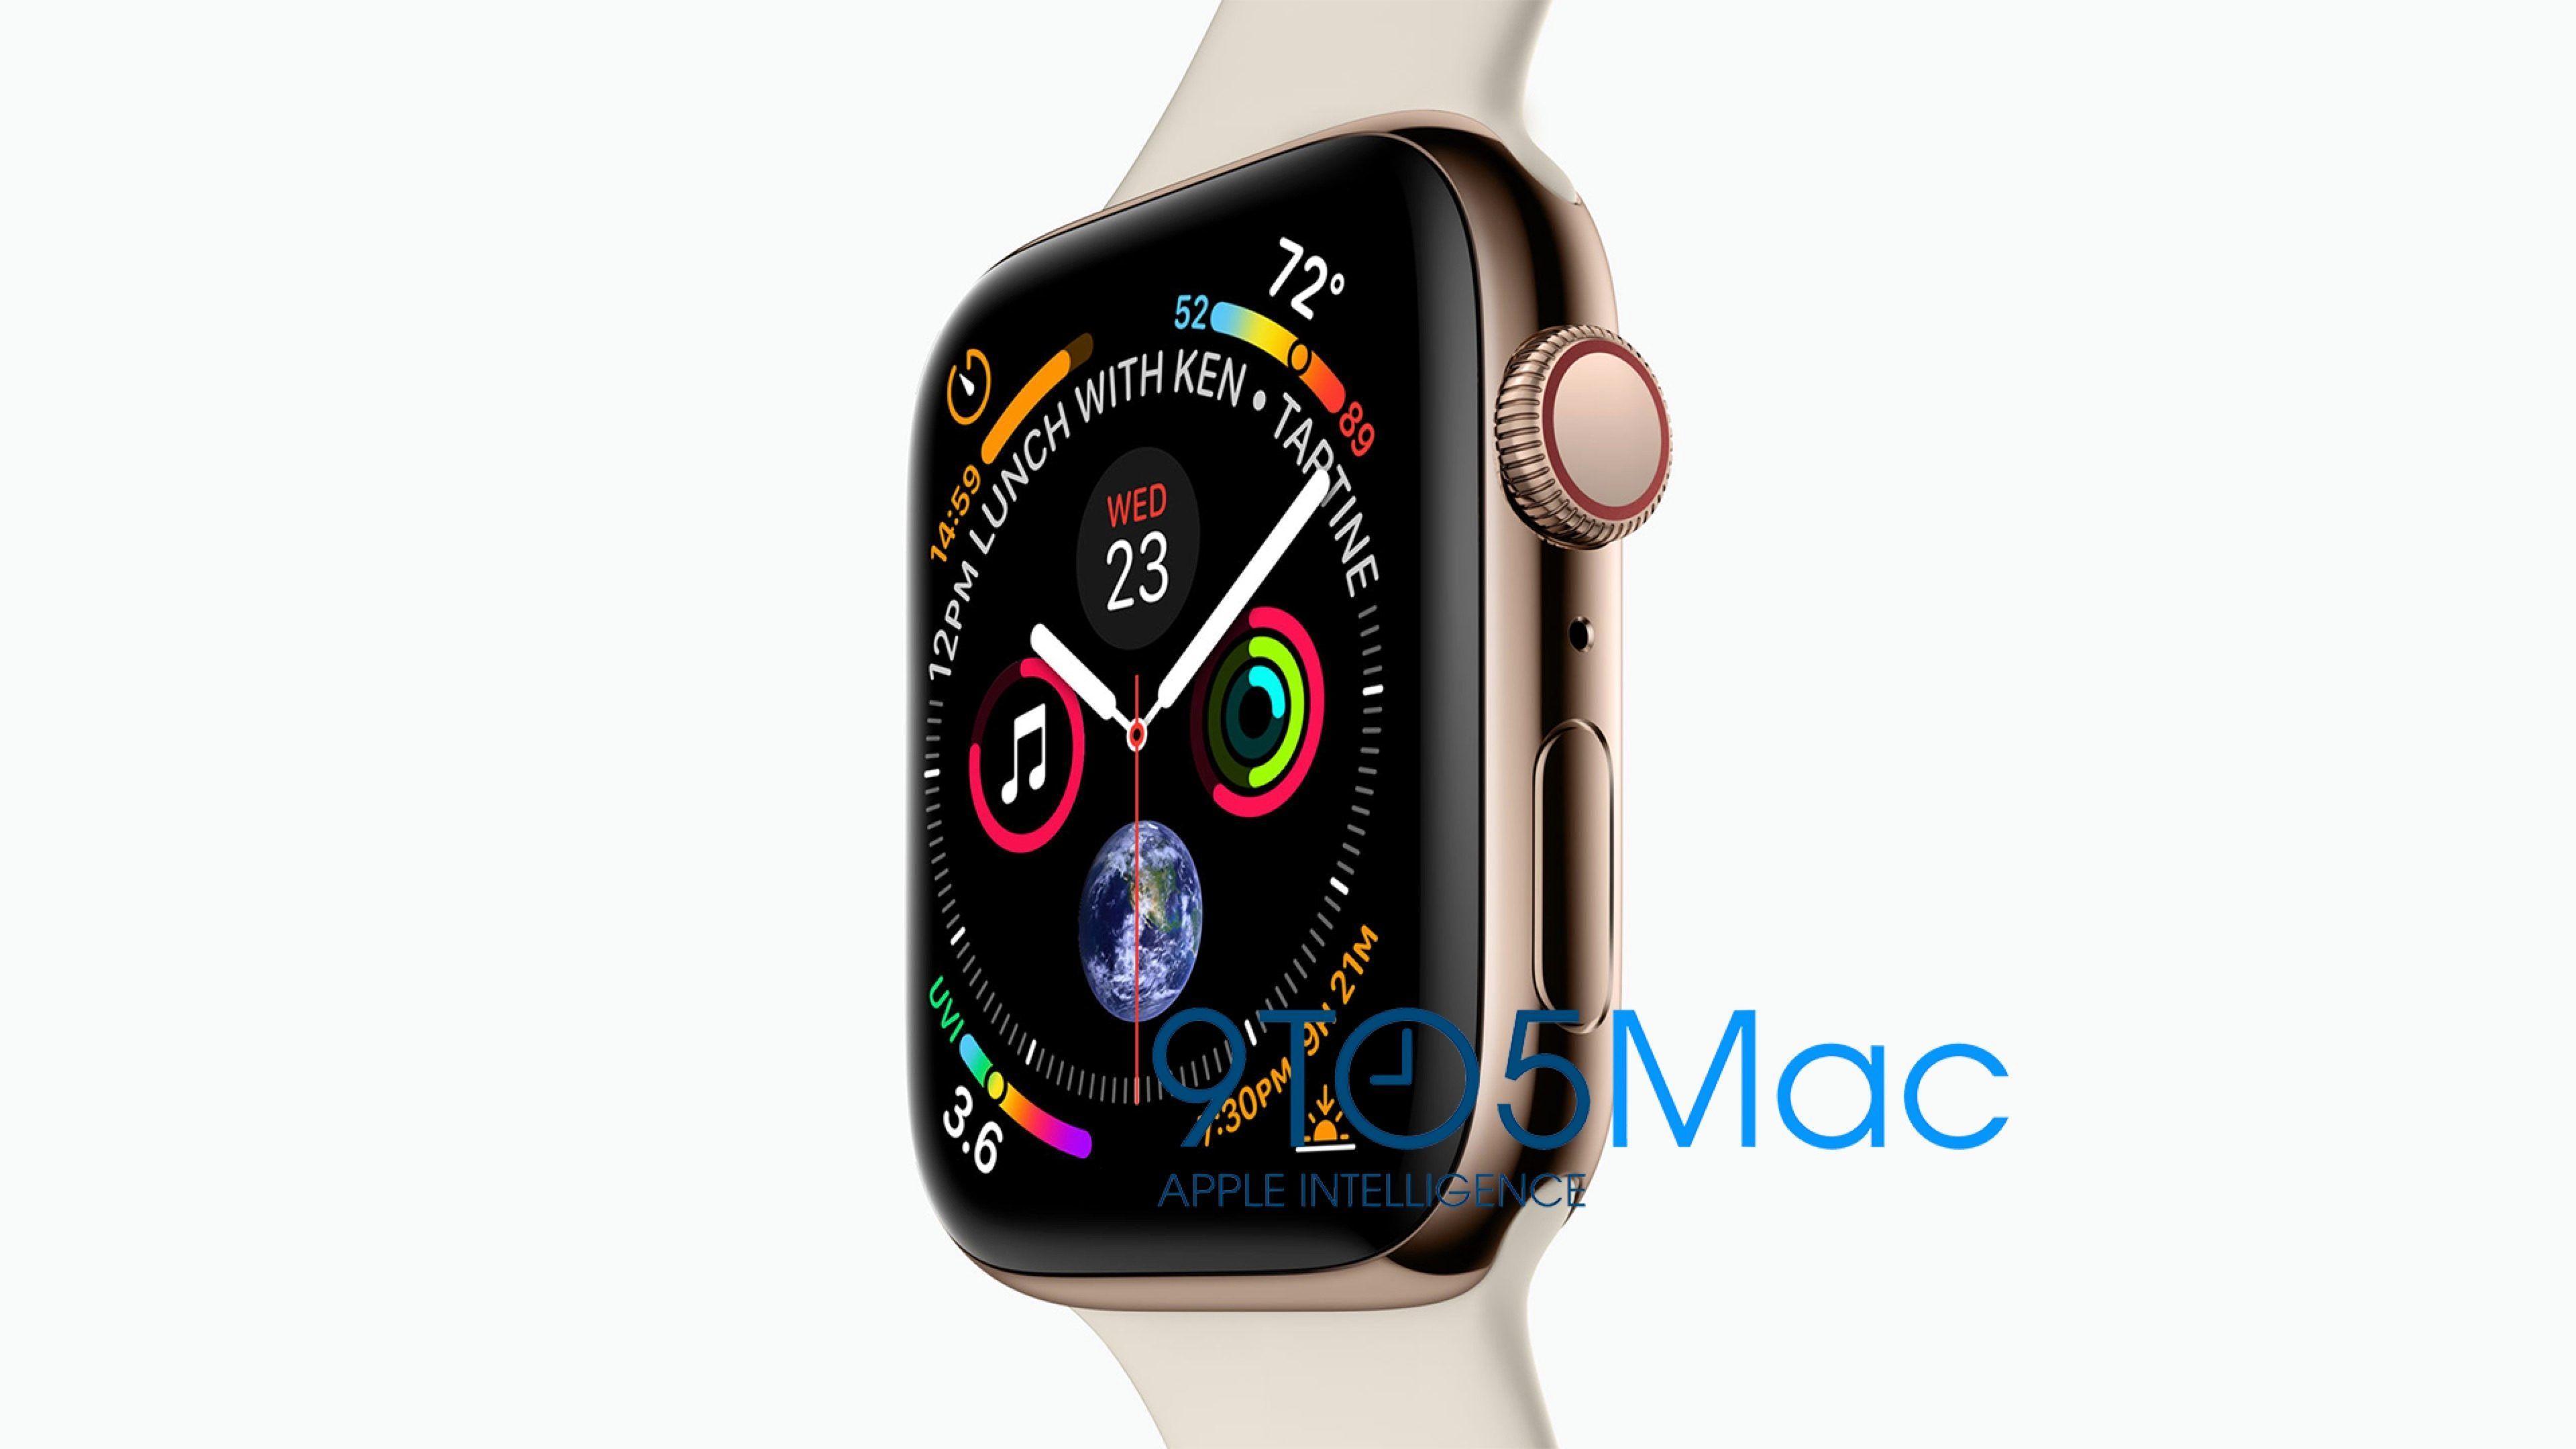 Nye Apple Watch, ifølge 9to5Mac.